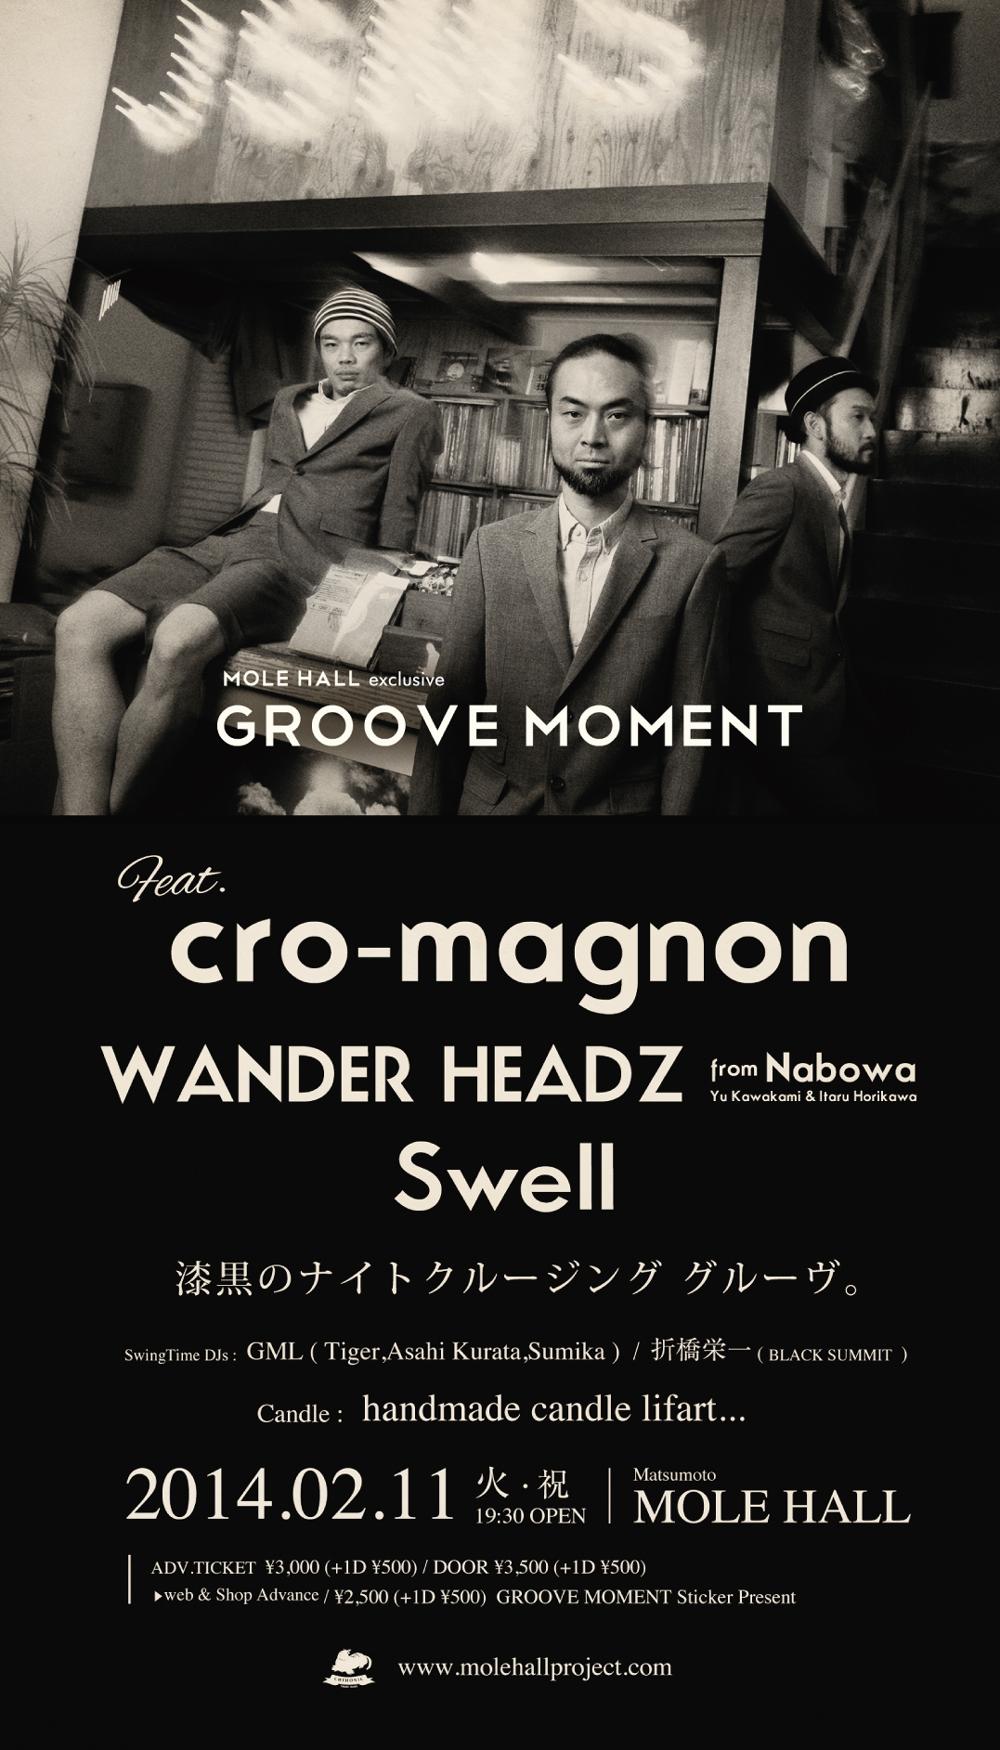 cre-magnon + WANDER HEADZ